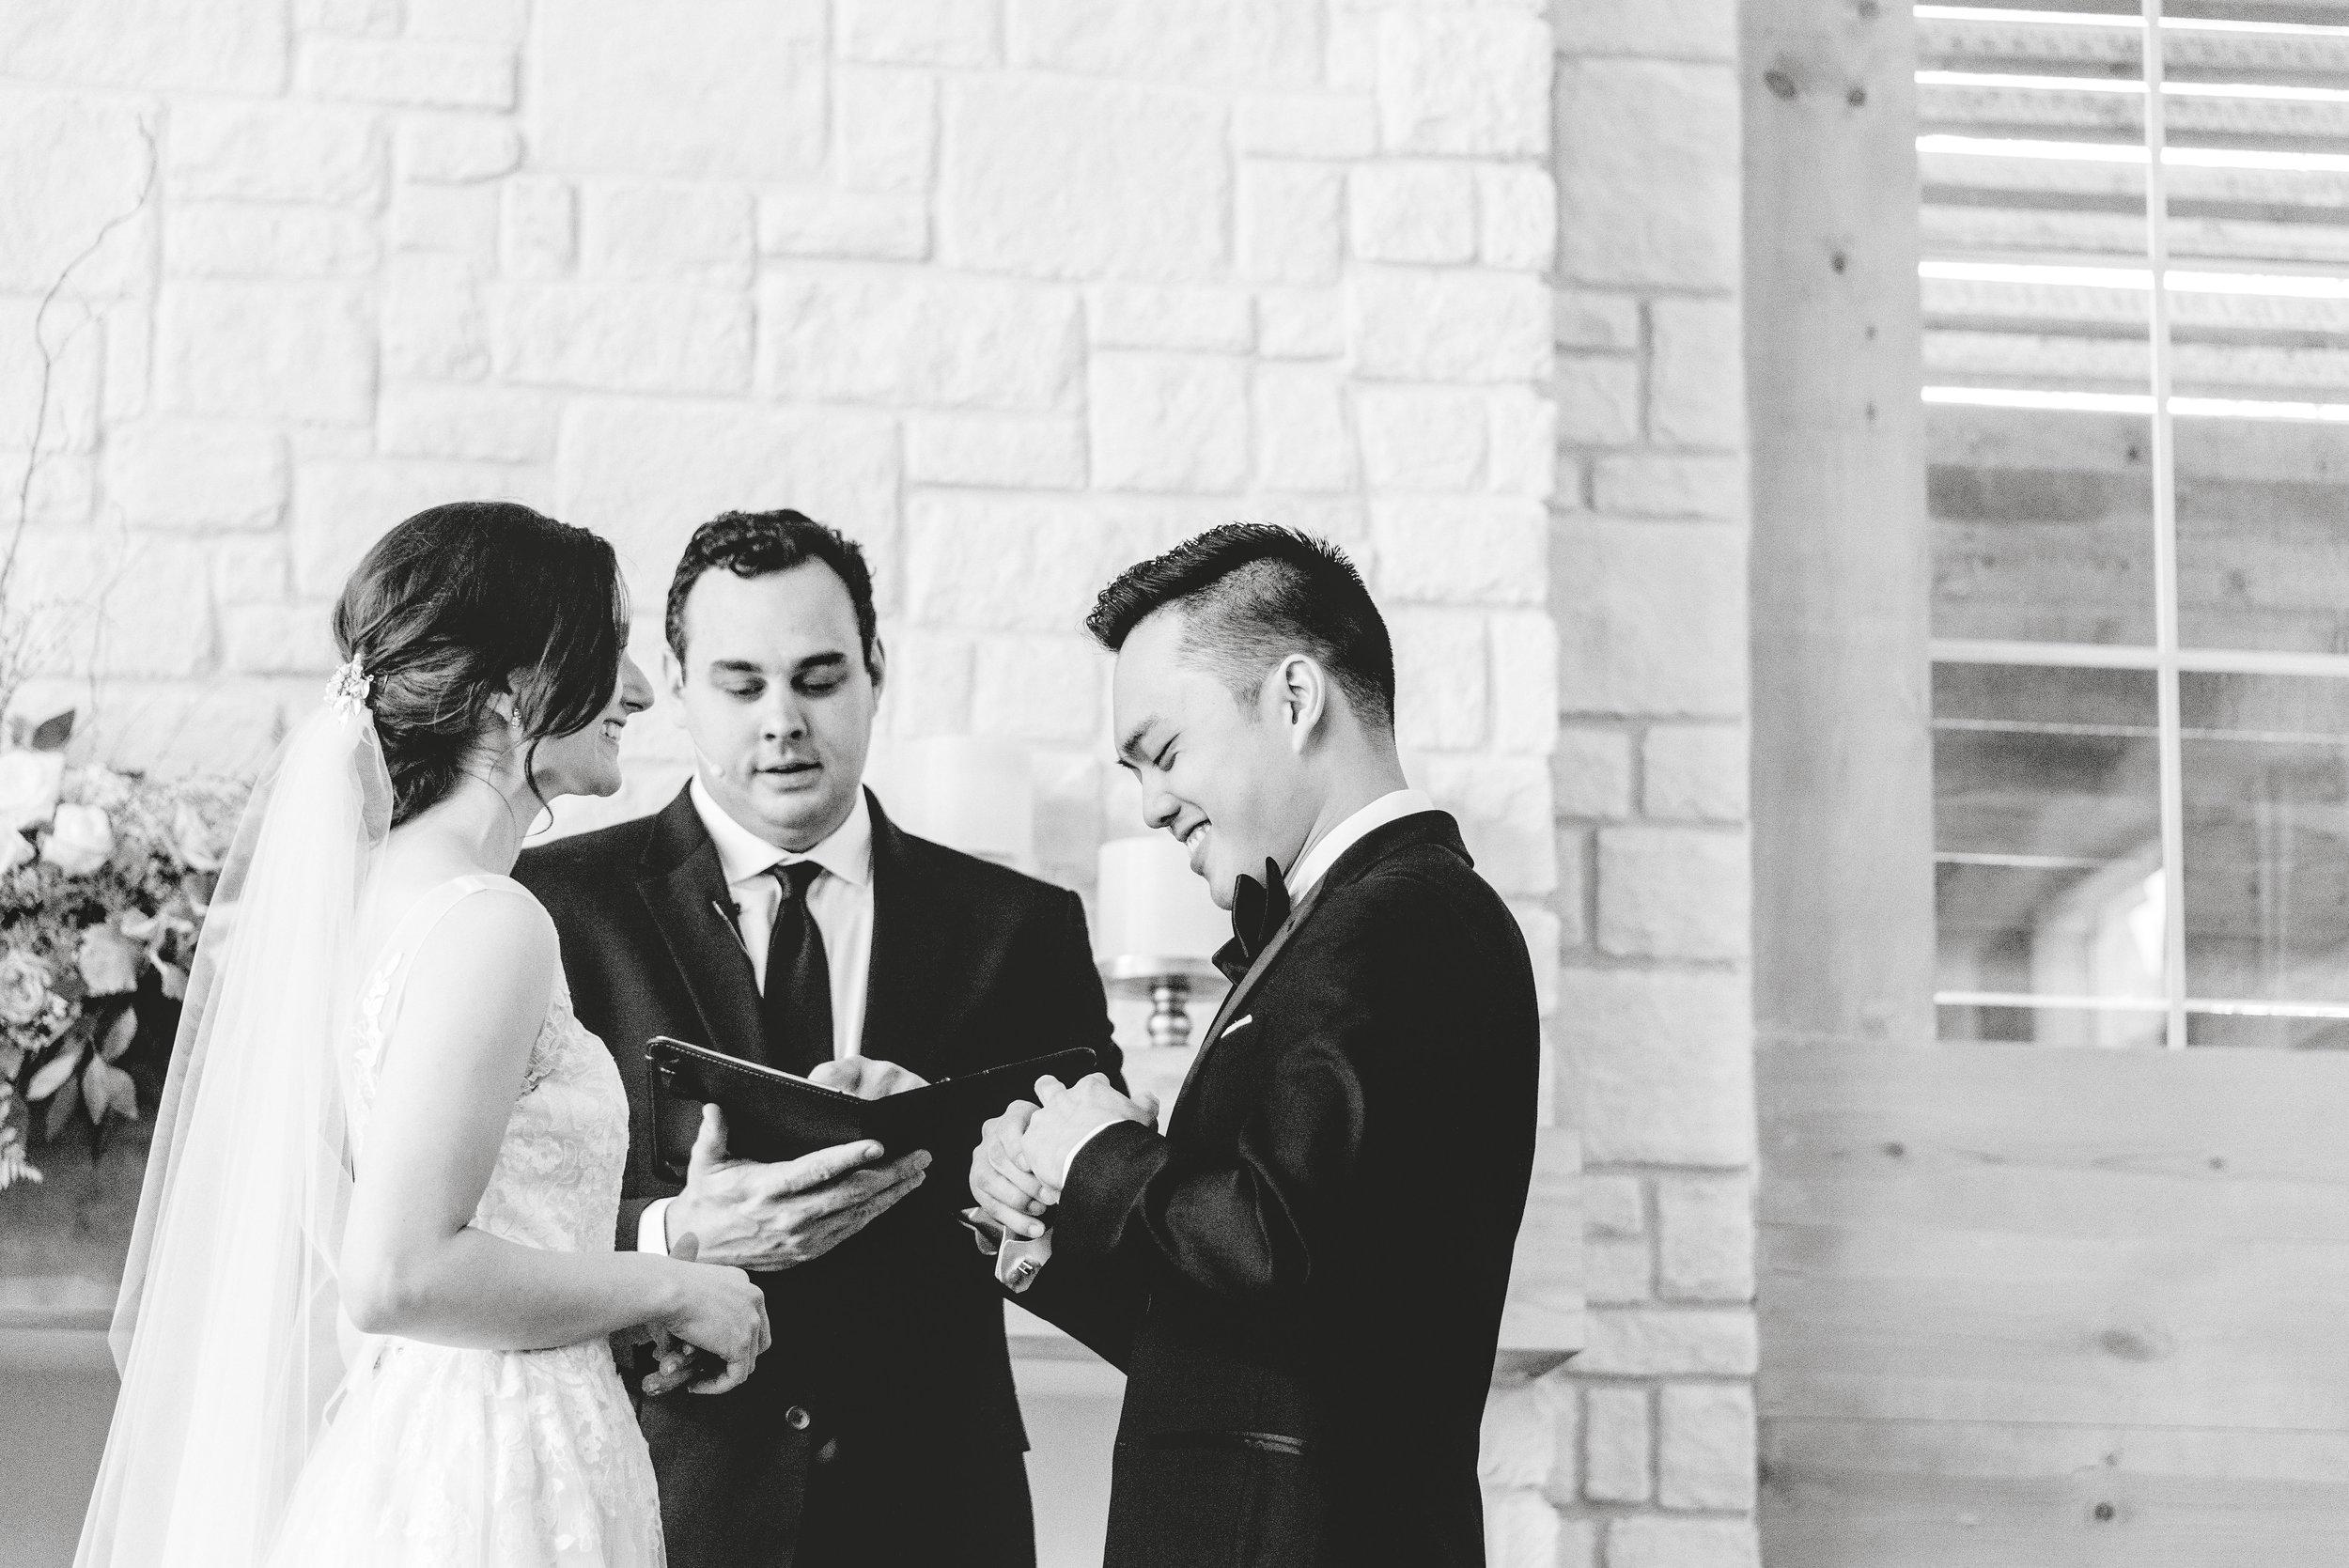 gray-door-photography-wedding-photographer-steph-erffmeyer-dallas-destination9.jpg